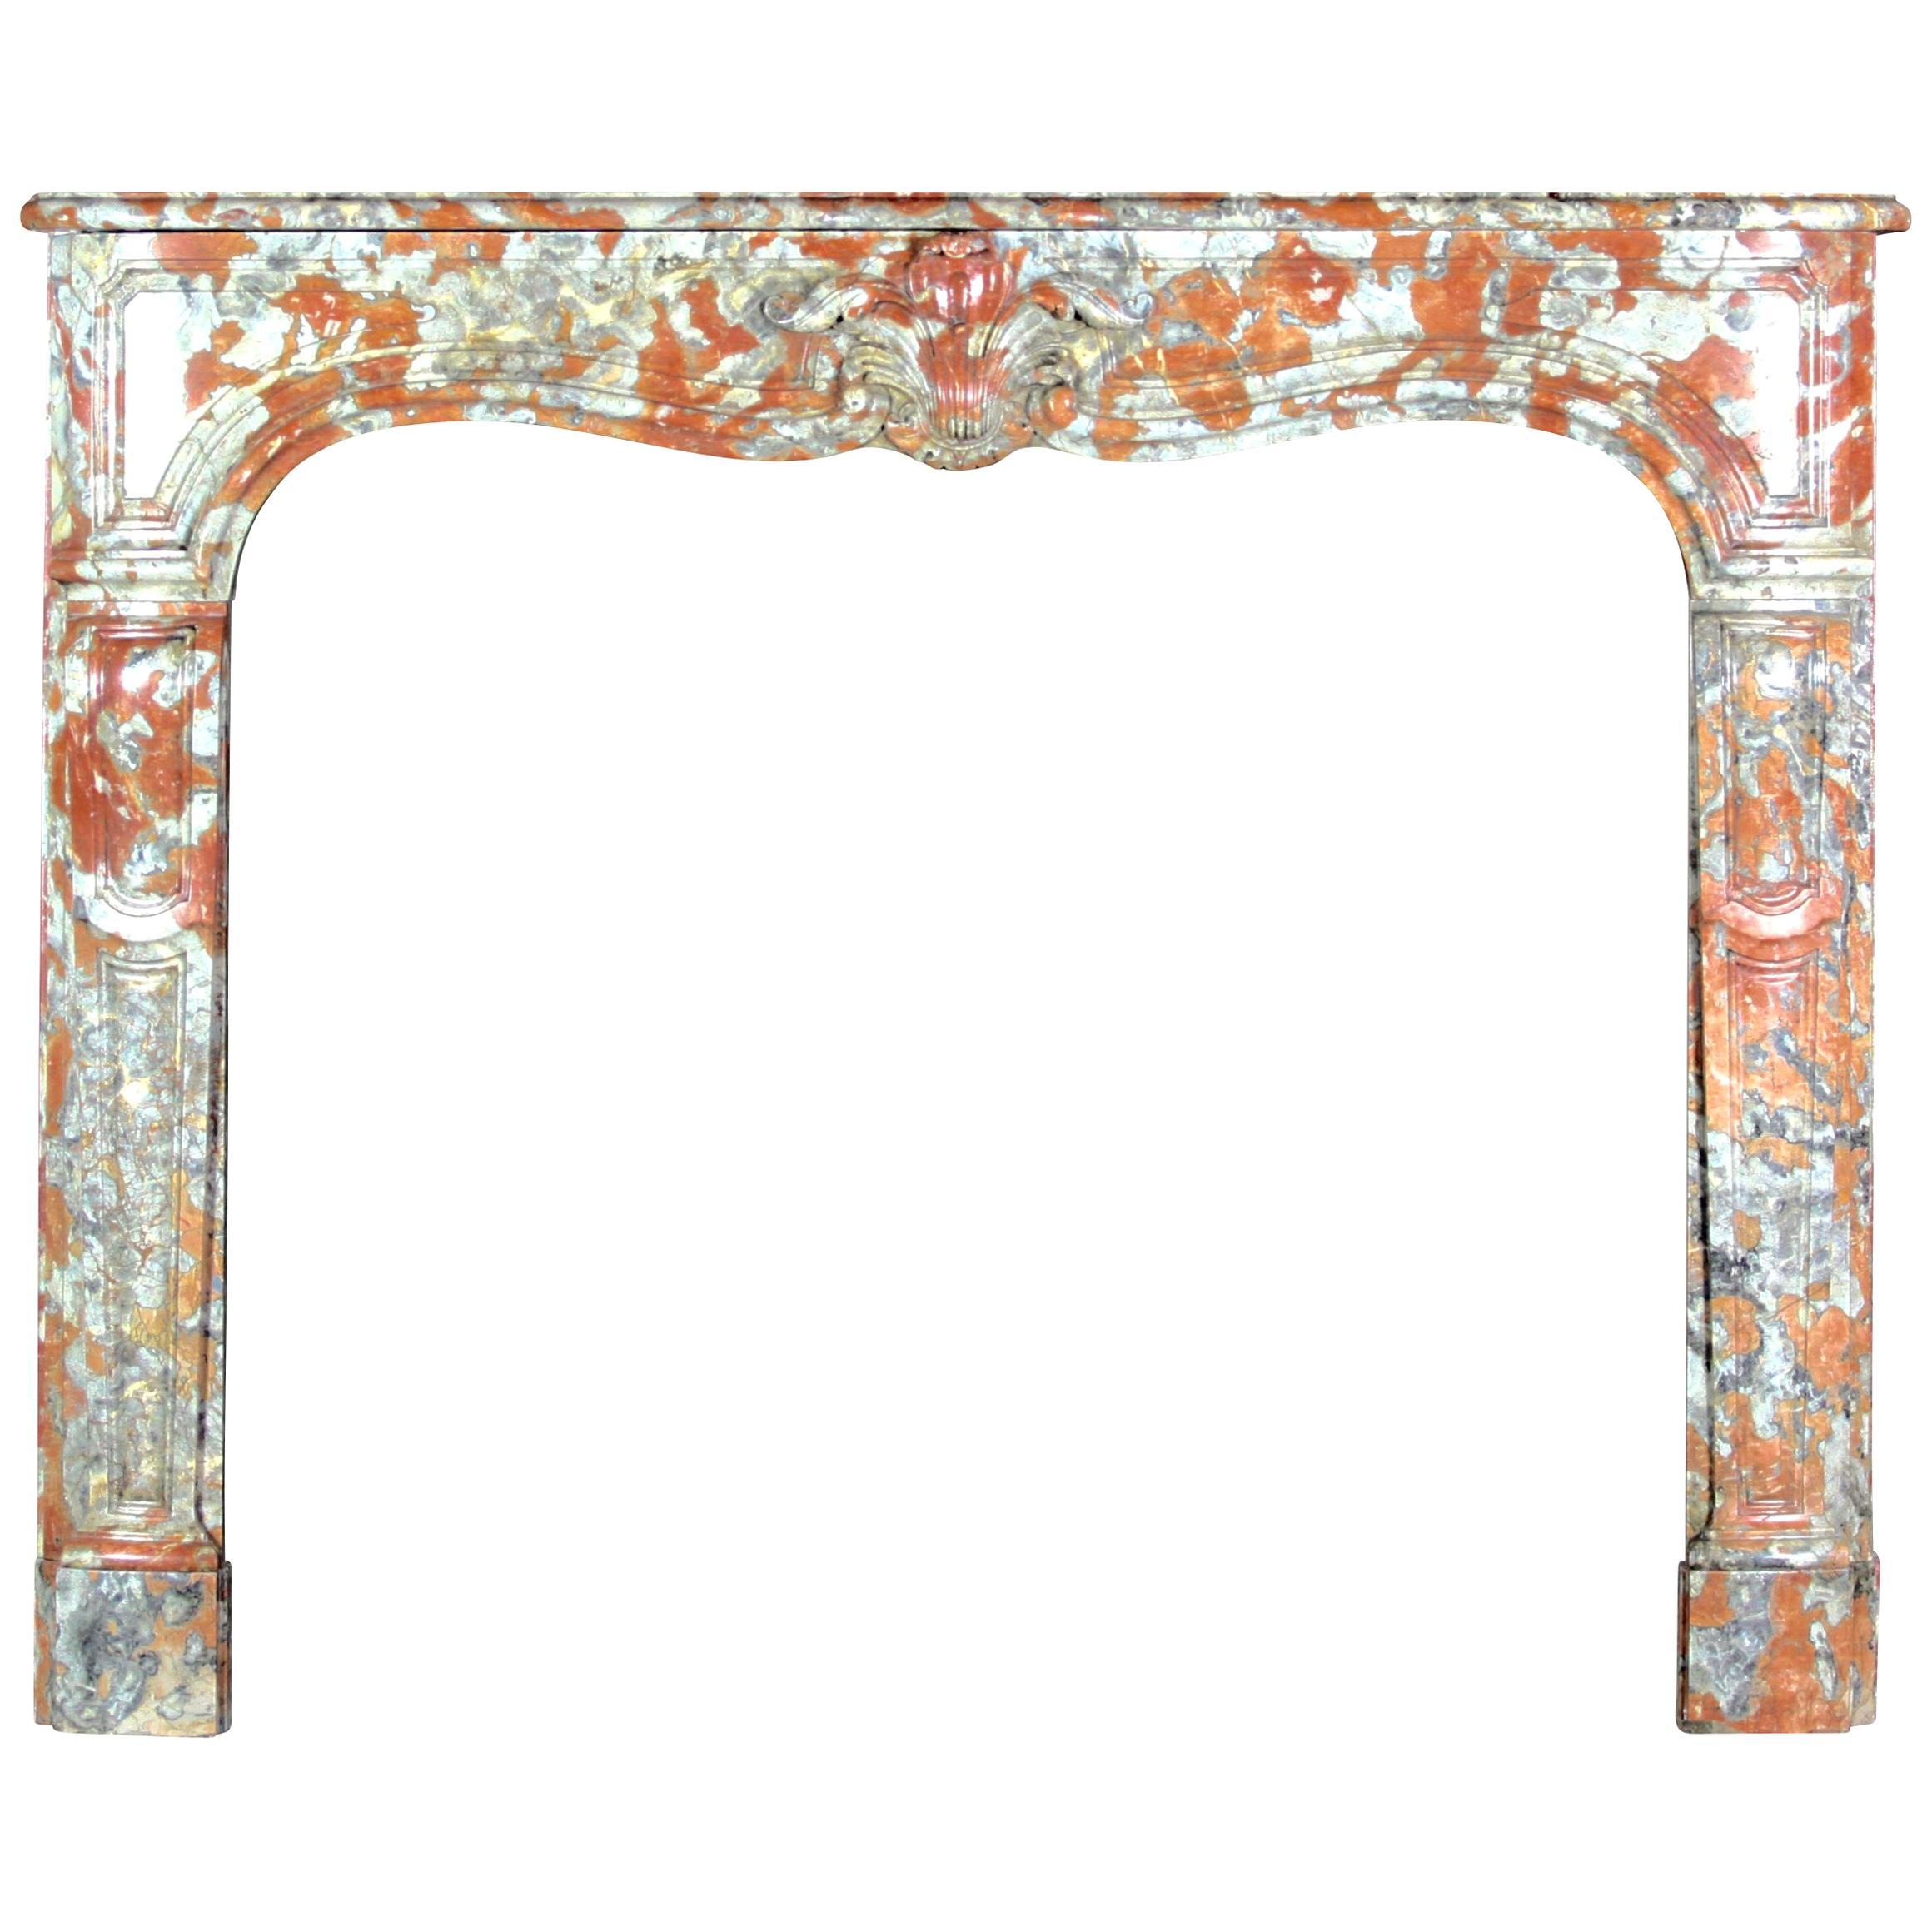 18th Century Fine Parisian Regency Antique Fireplace Surround in Marble